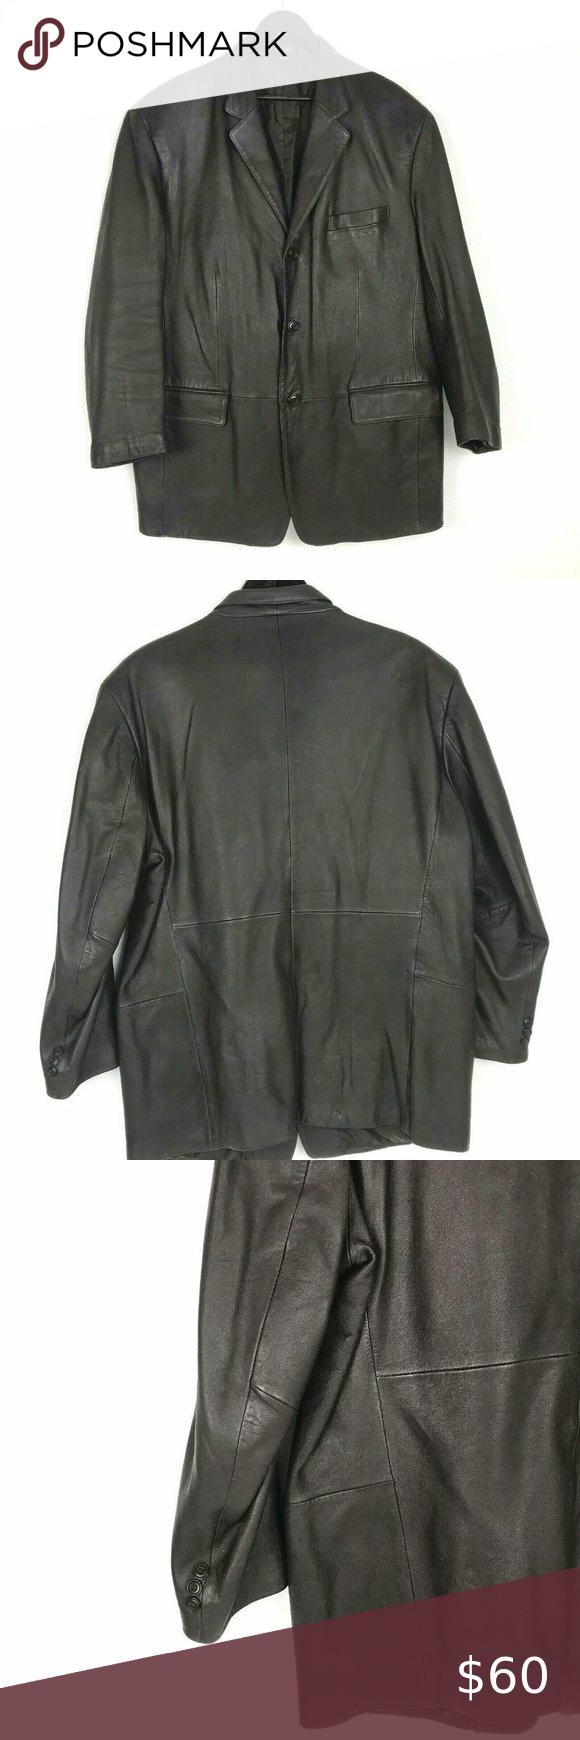 J Ferrar L Black Leather Jacket Blazer Black Leather Jacket Leather Jacket Leather Fashion